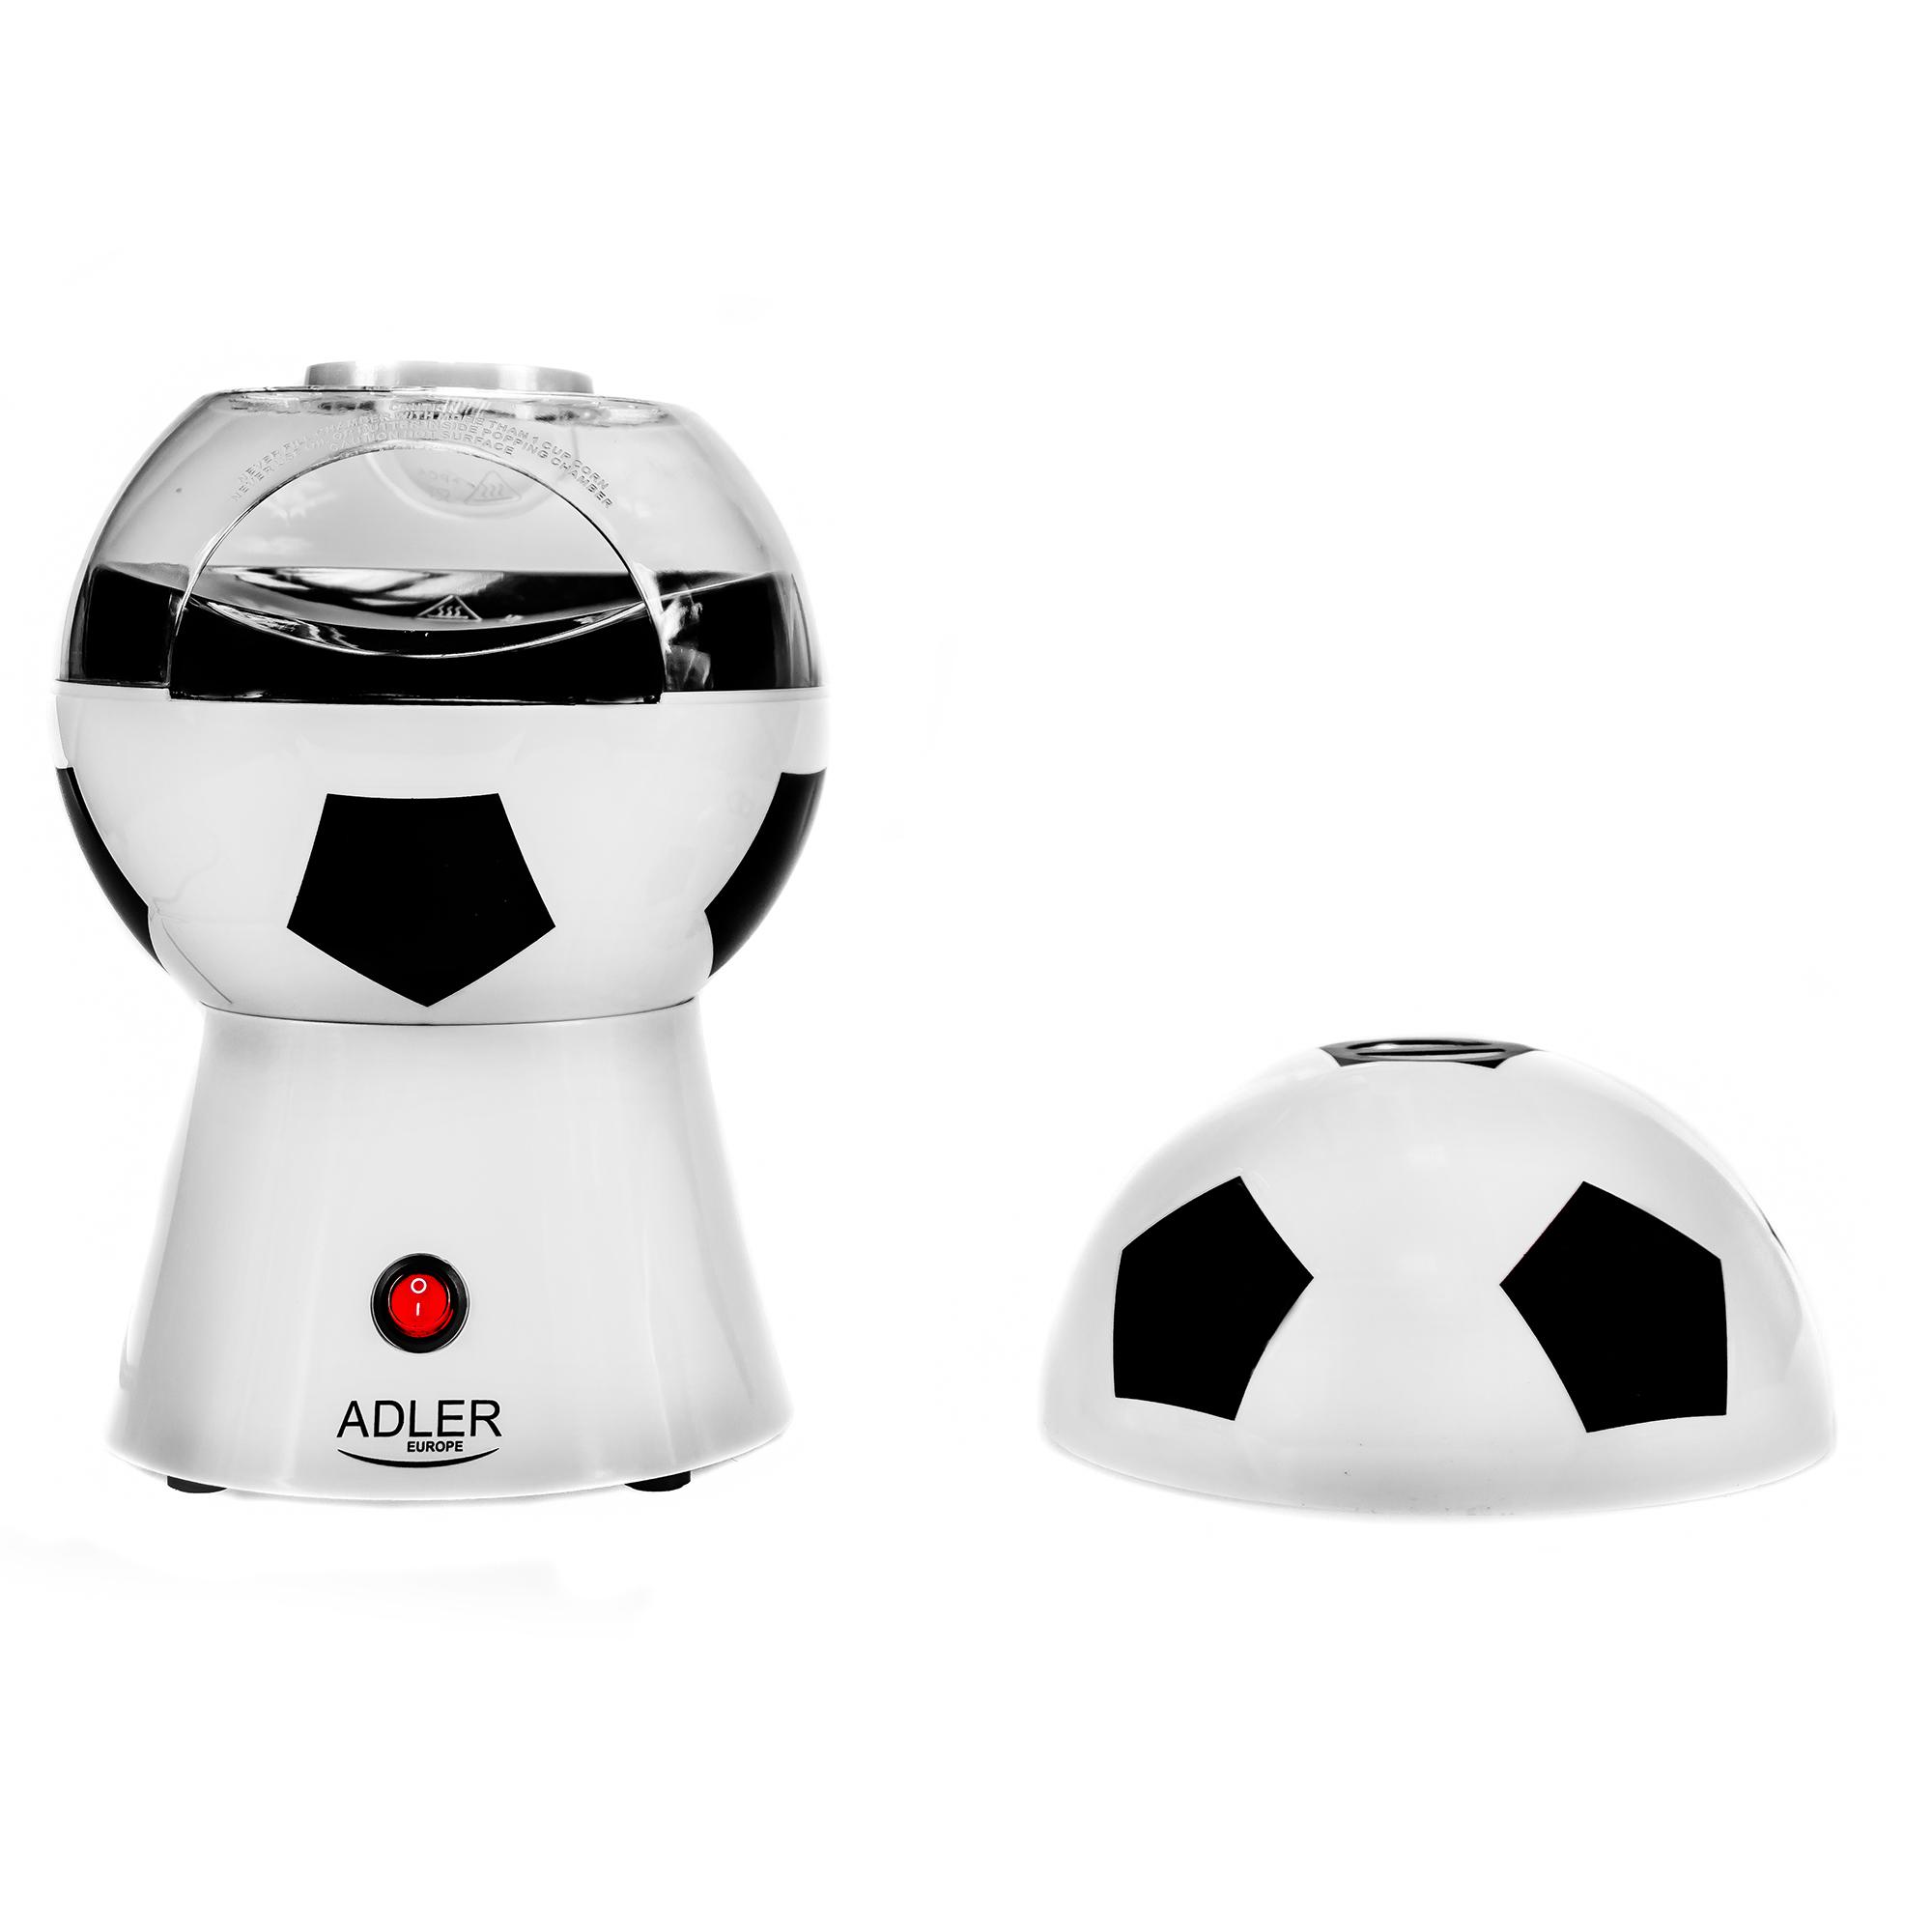 Adler AD 4479 Palomitero | Maquina de Palomitas de maíz, Aire Caliente Sin Grasa Aceite, Forma de Balón de futbol, Eléctrica, 1200W